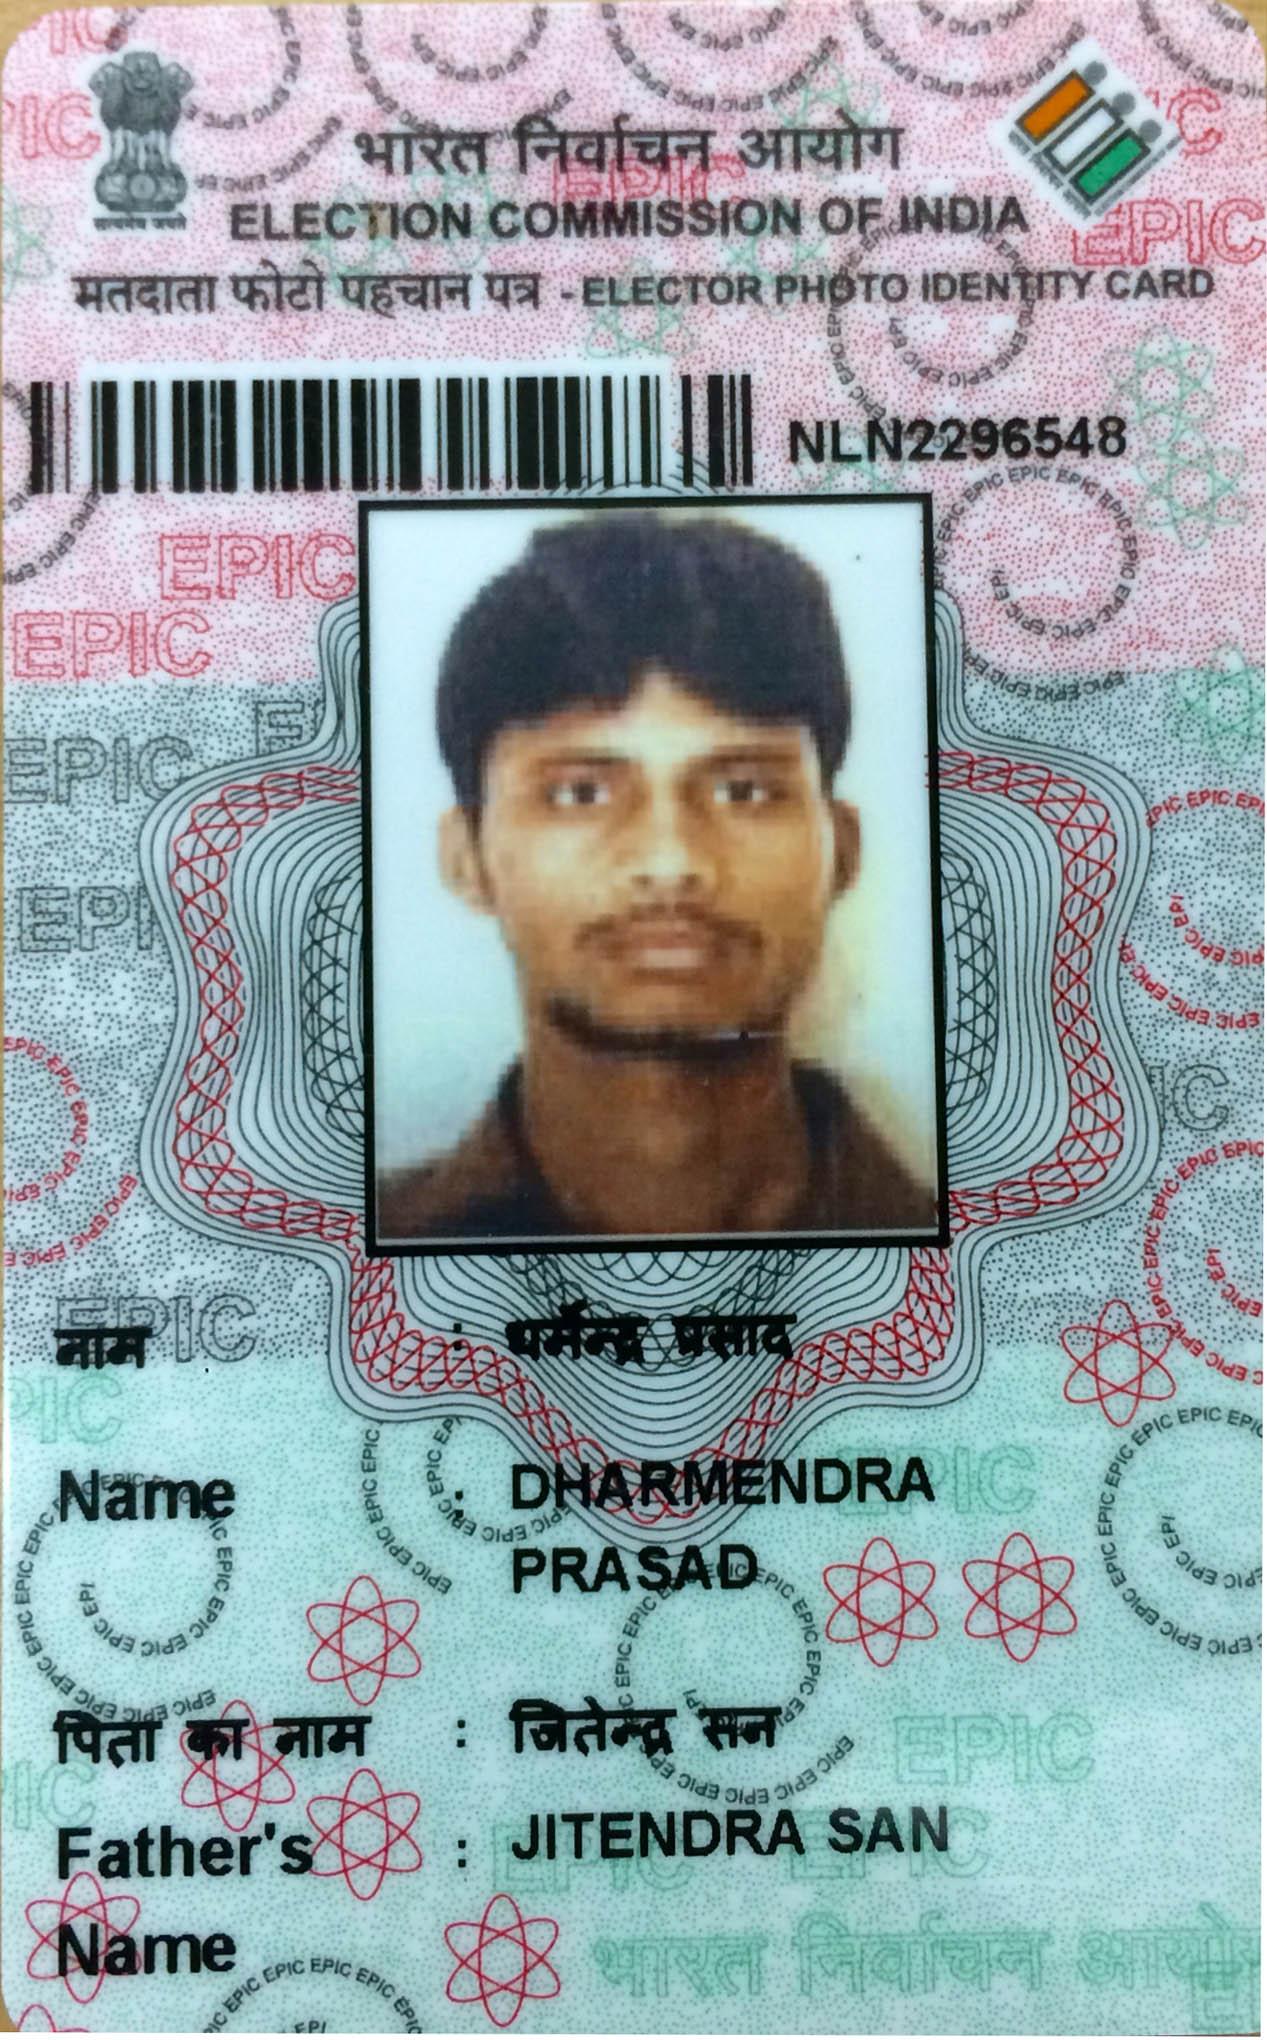 Dharmendra Prasad